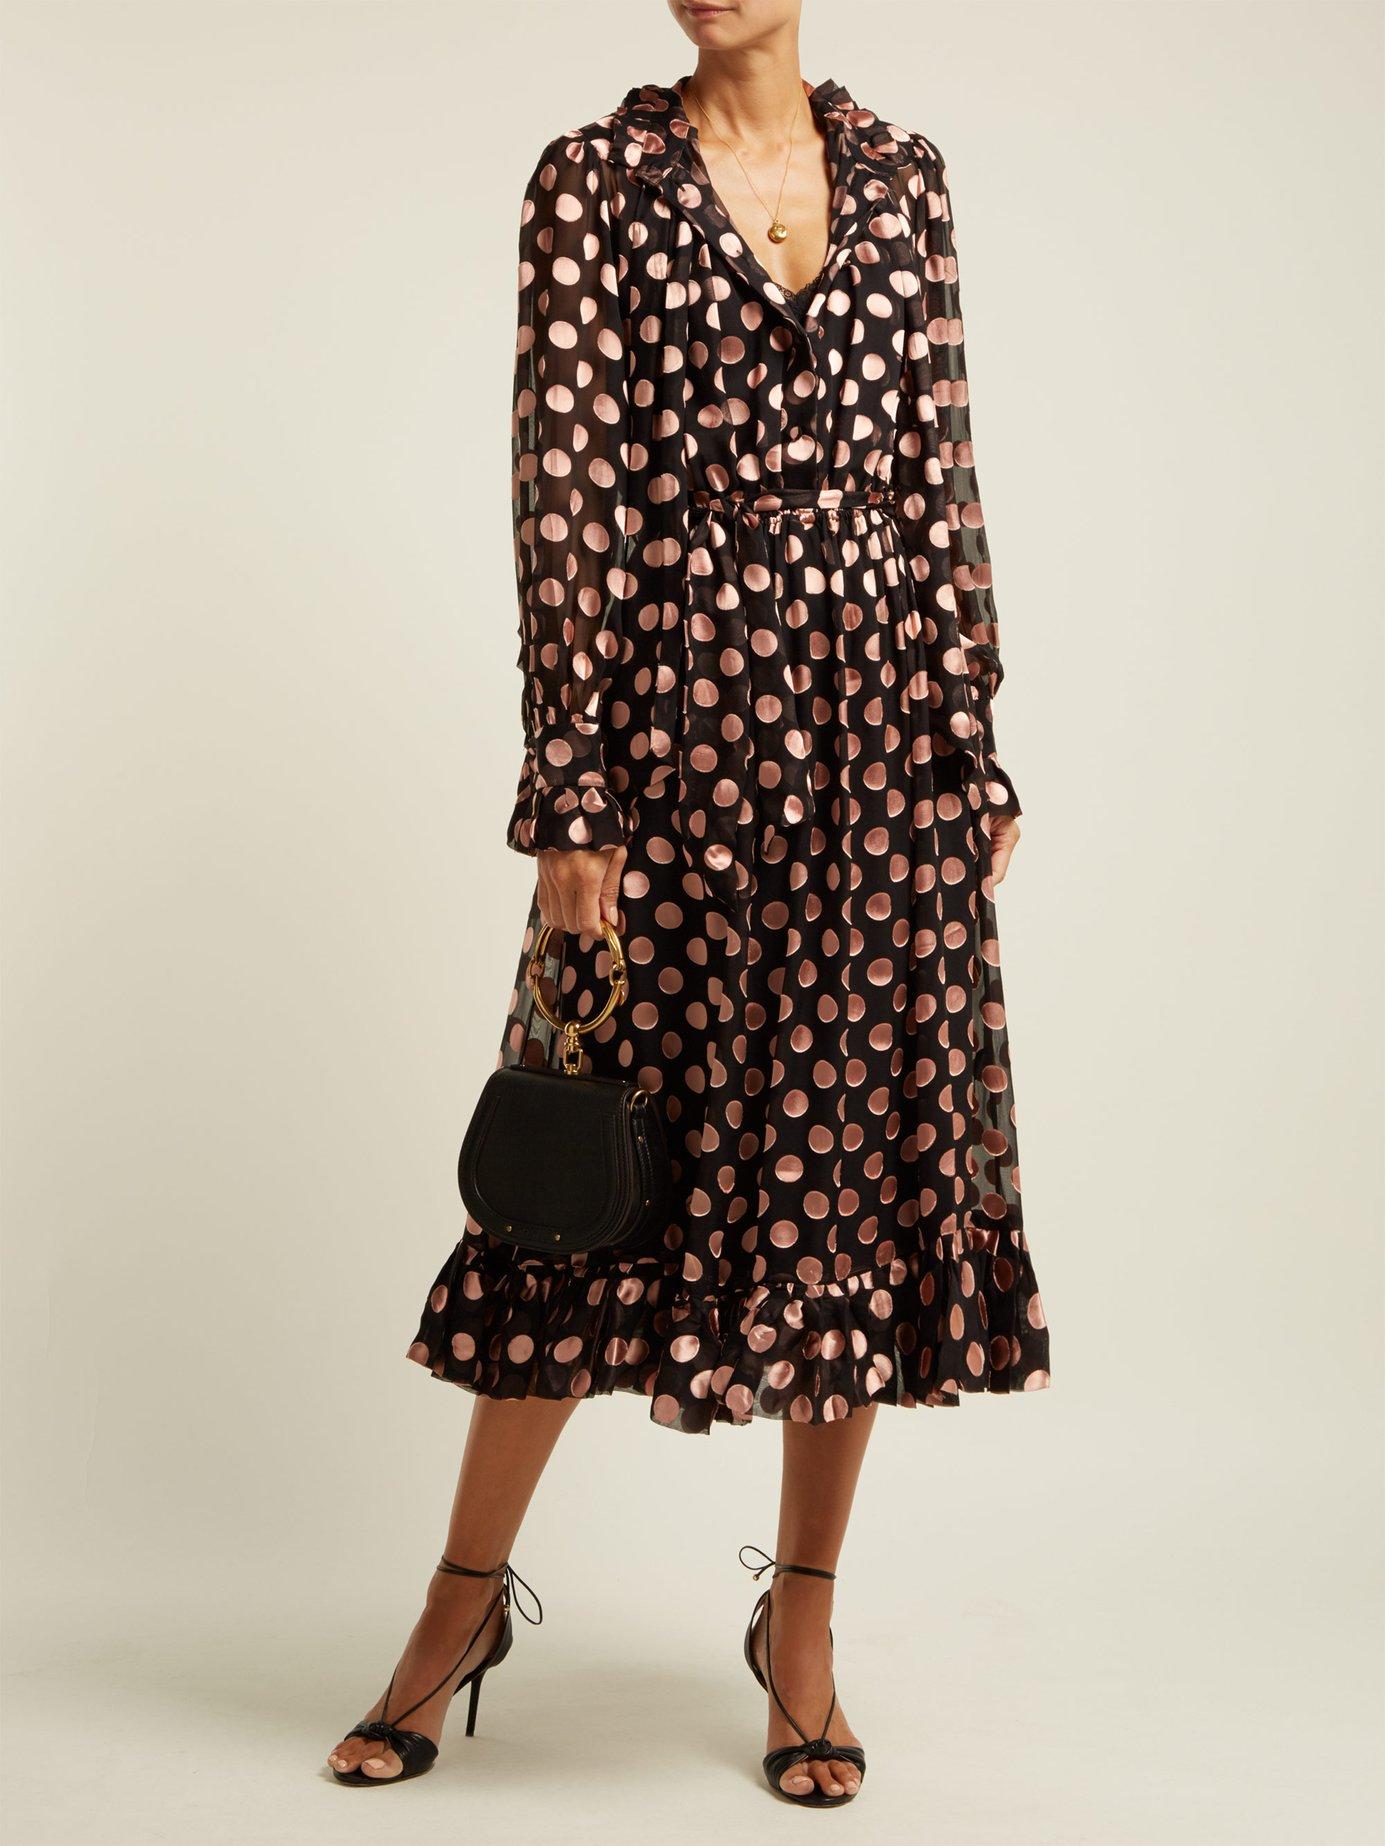 Polka-dot crepe-chiffon dress by Zimmermann